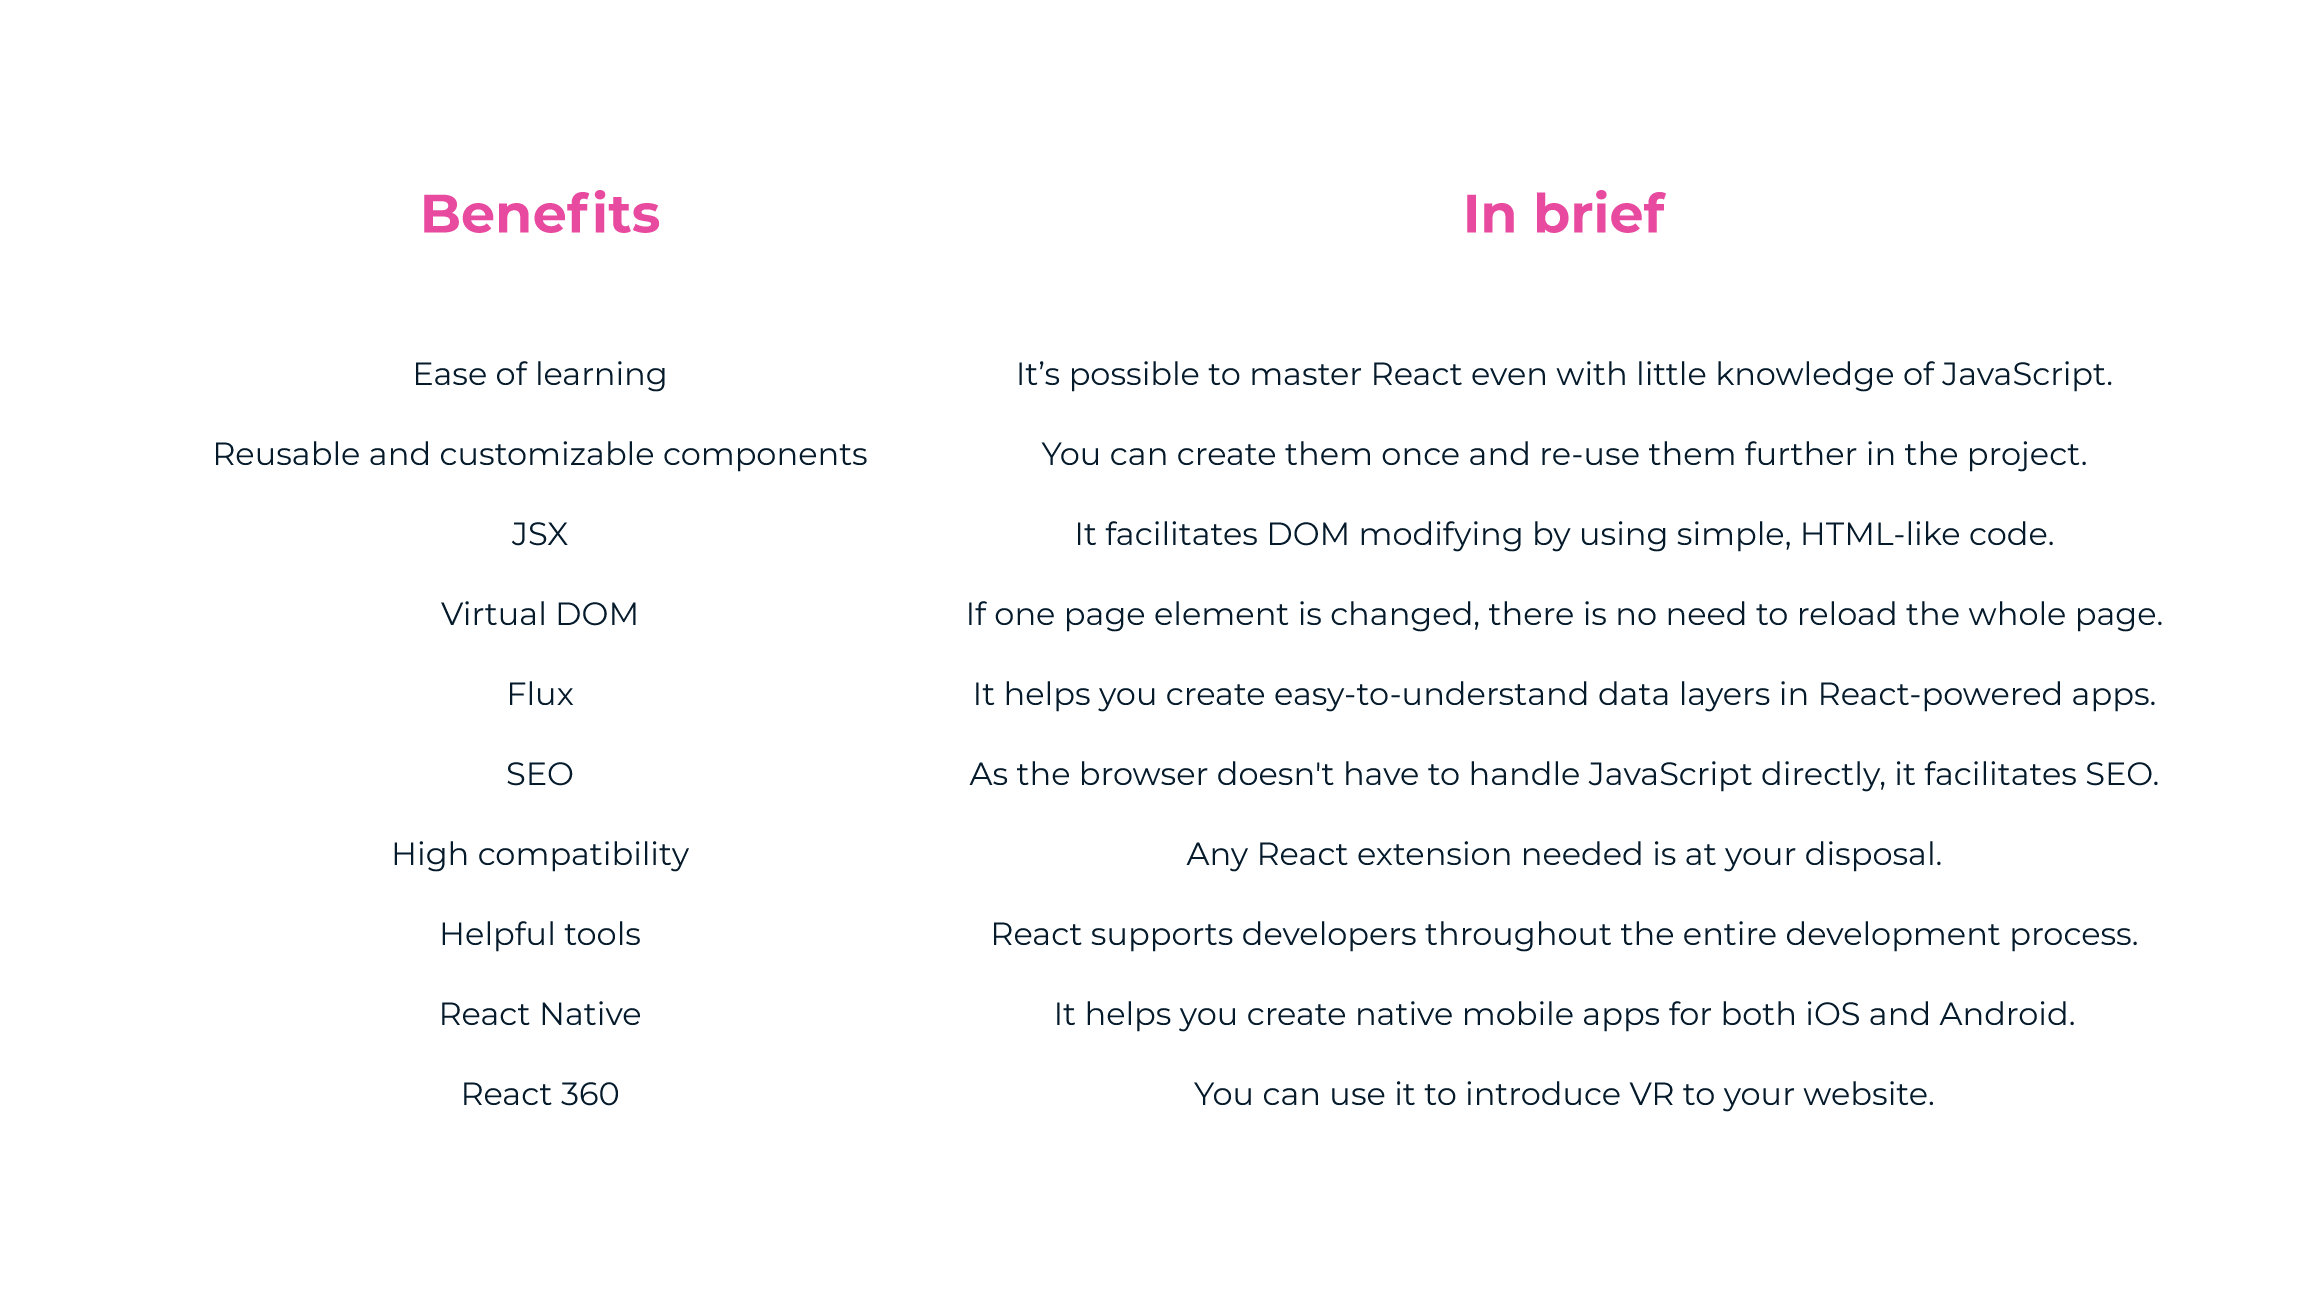 benefits-of-react-summary